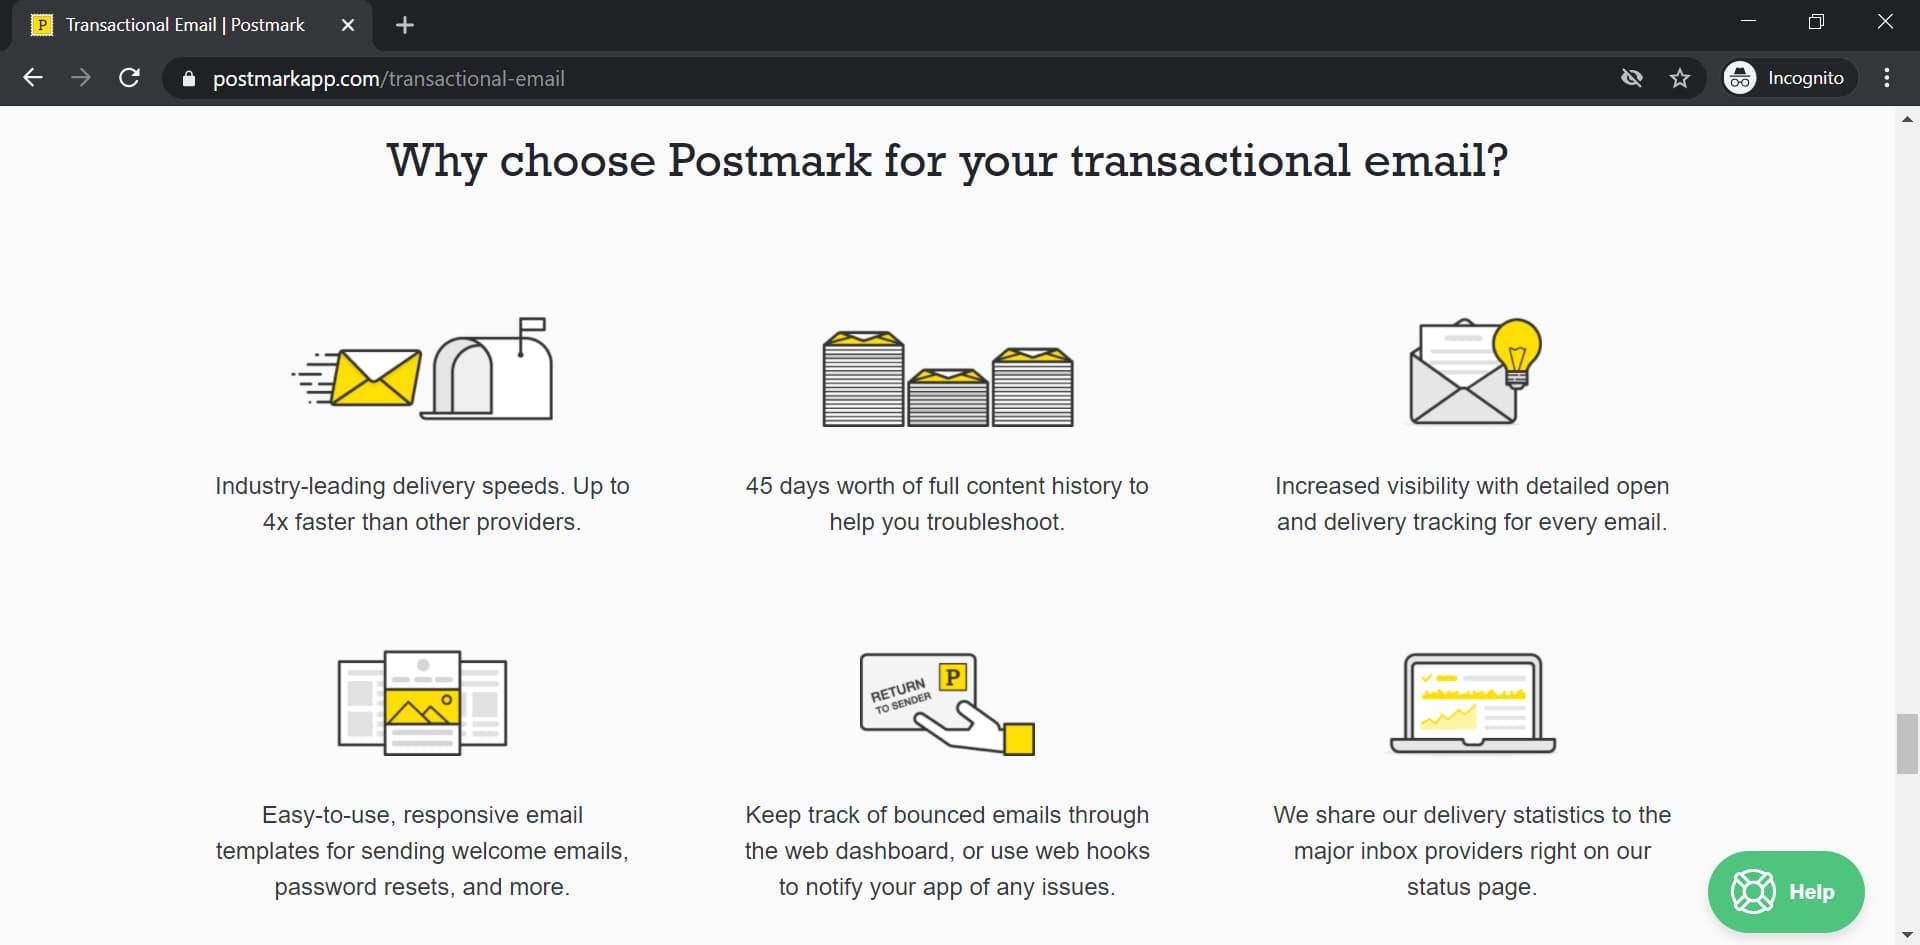 Postmark transactional email service